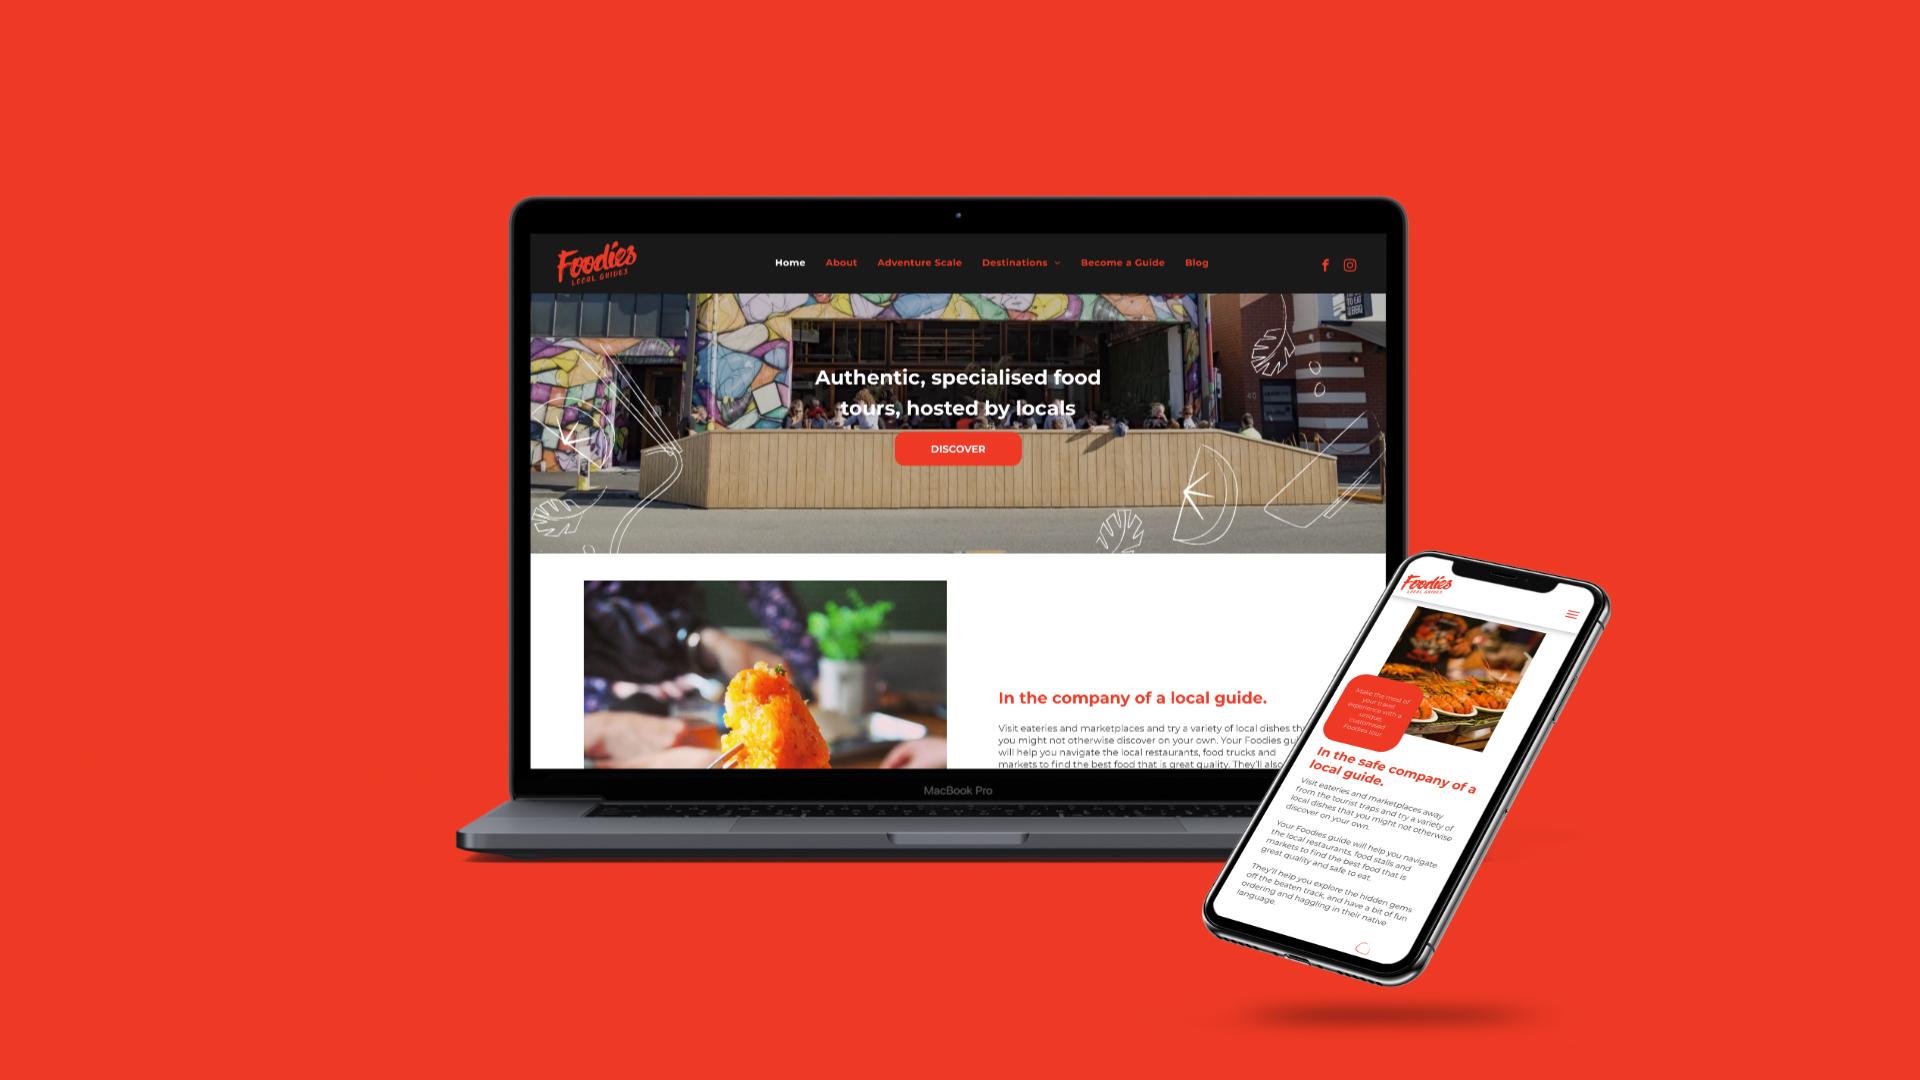 attraction studio foodies brand web desktop and mobile view